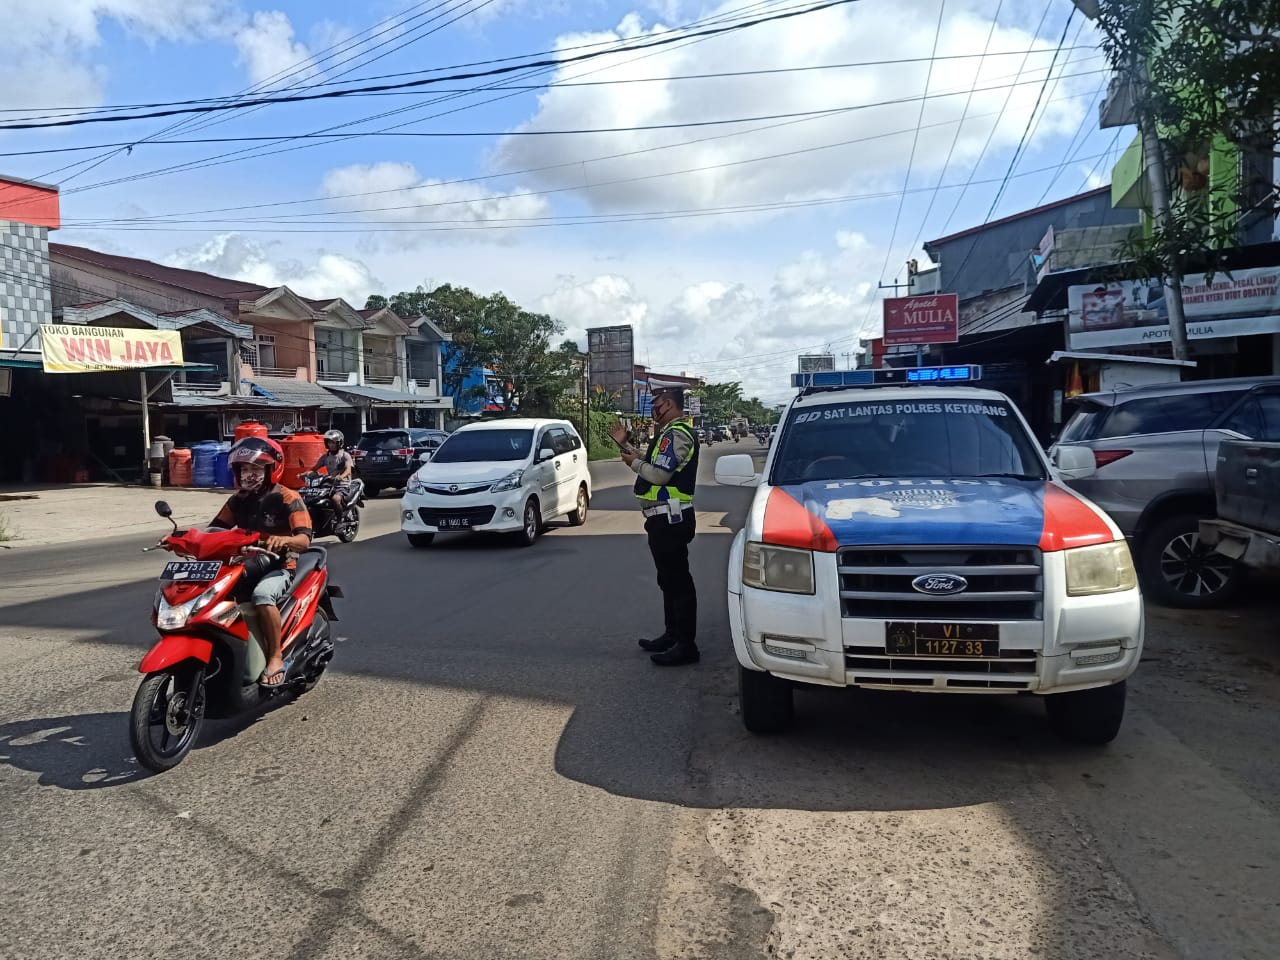 Satlantas Polres Ketapang Terus Lakukan Patroli di Beberapa Titik Rawan Laka Dan Langgar